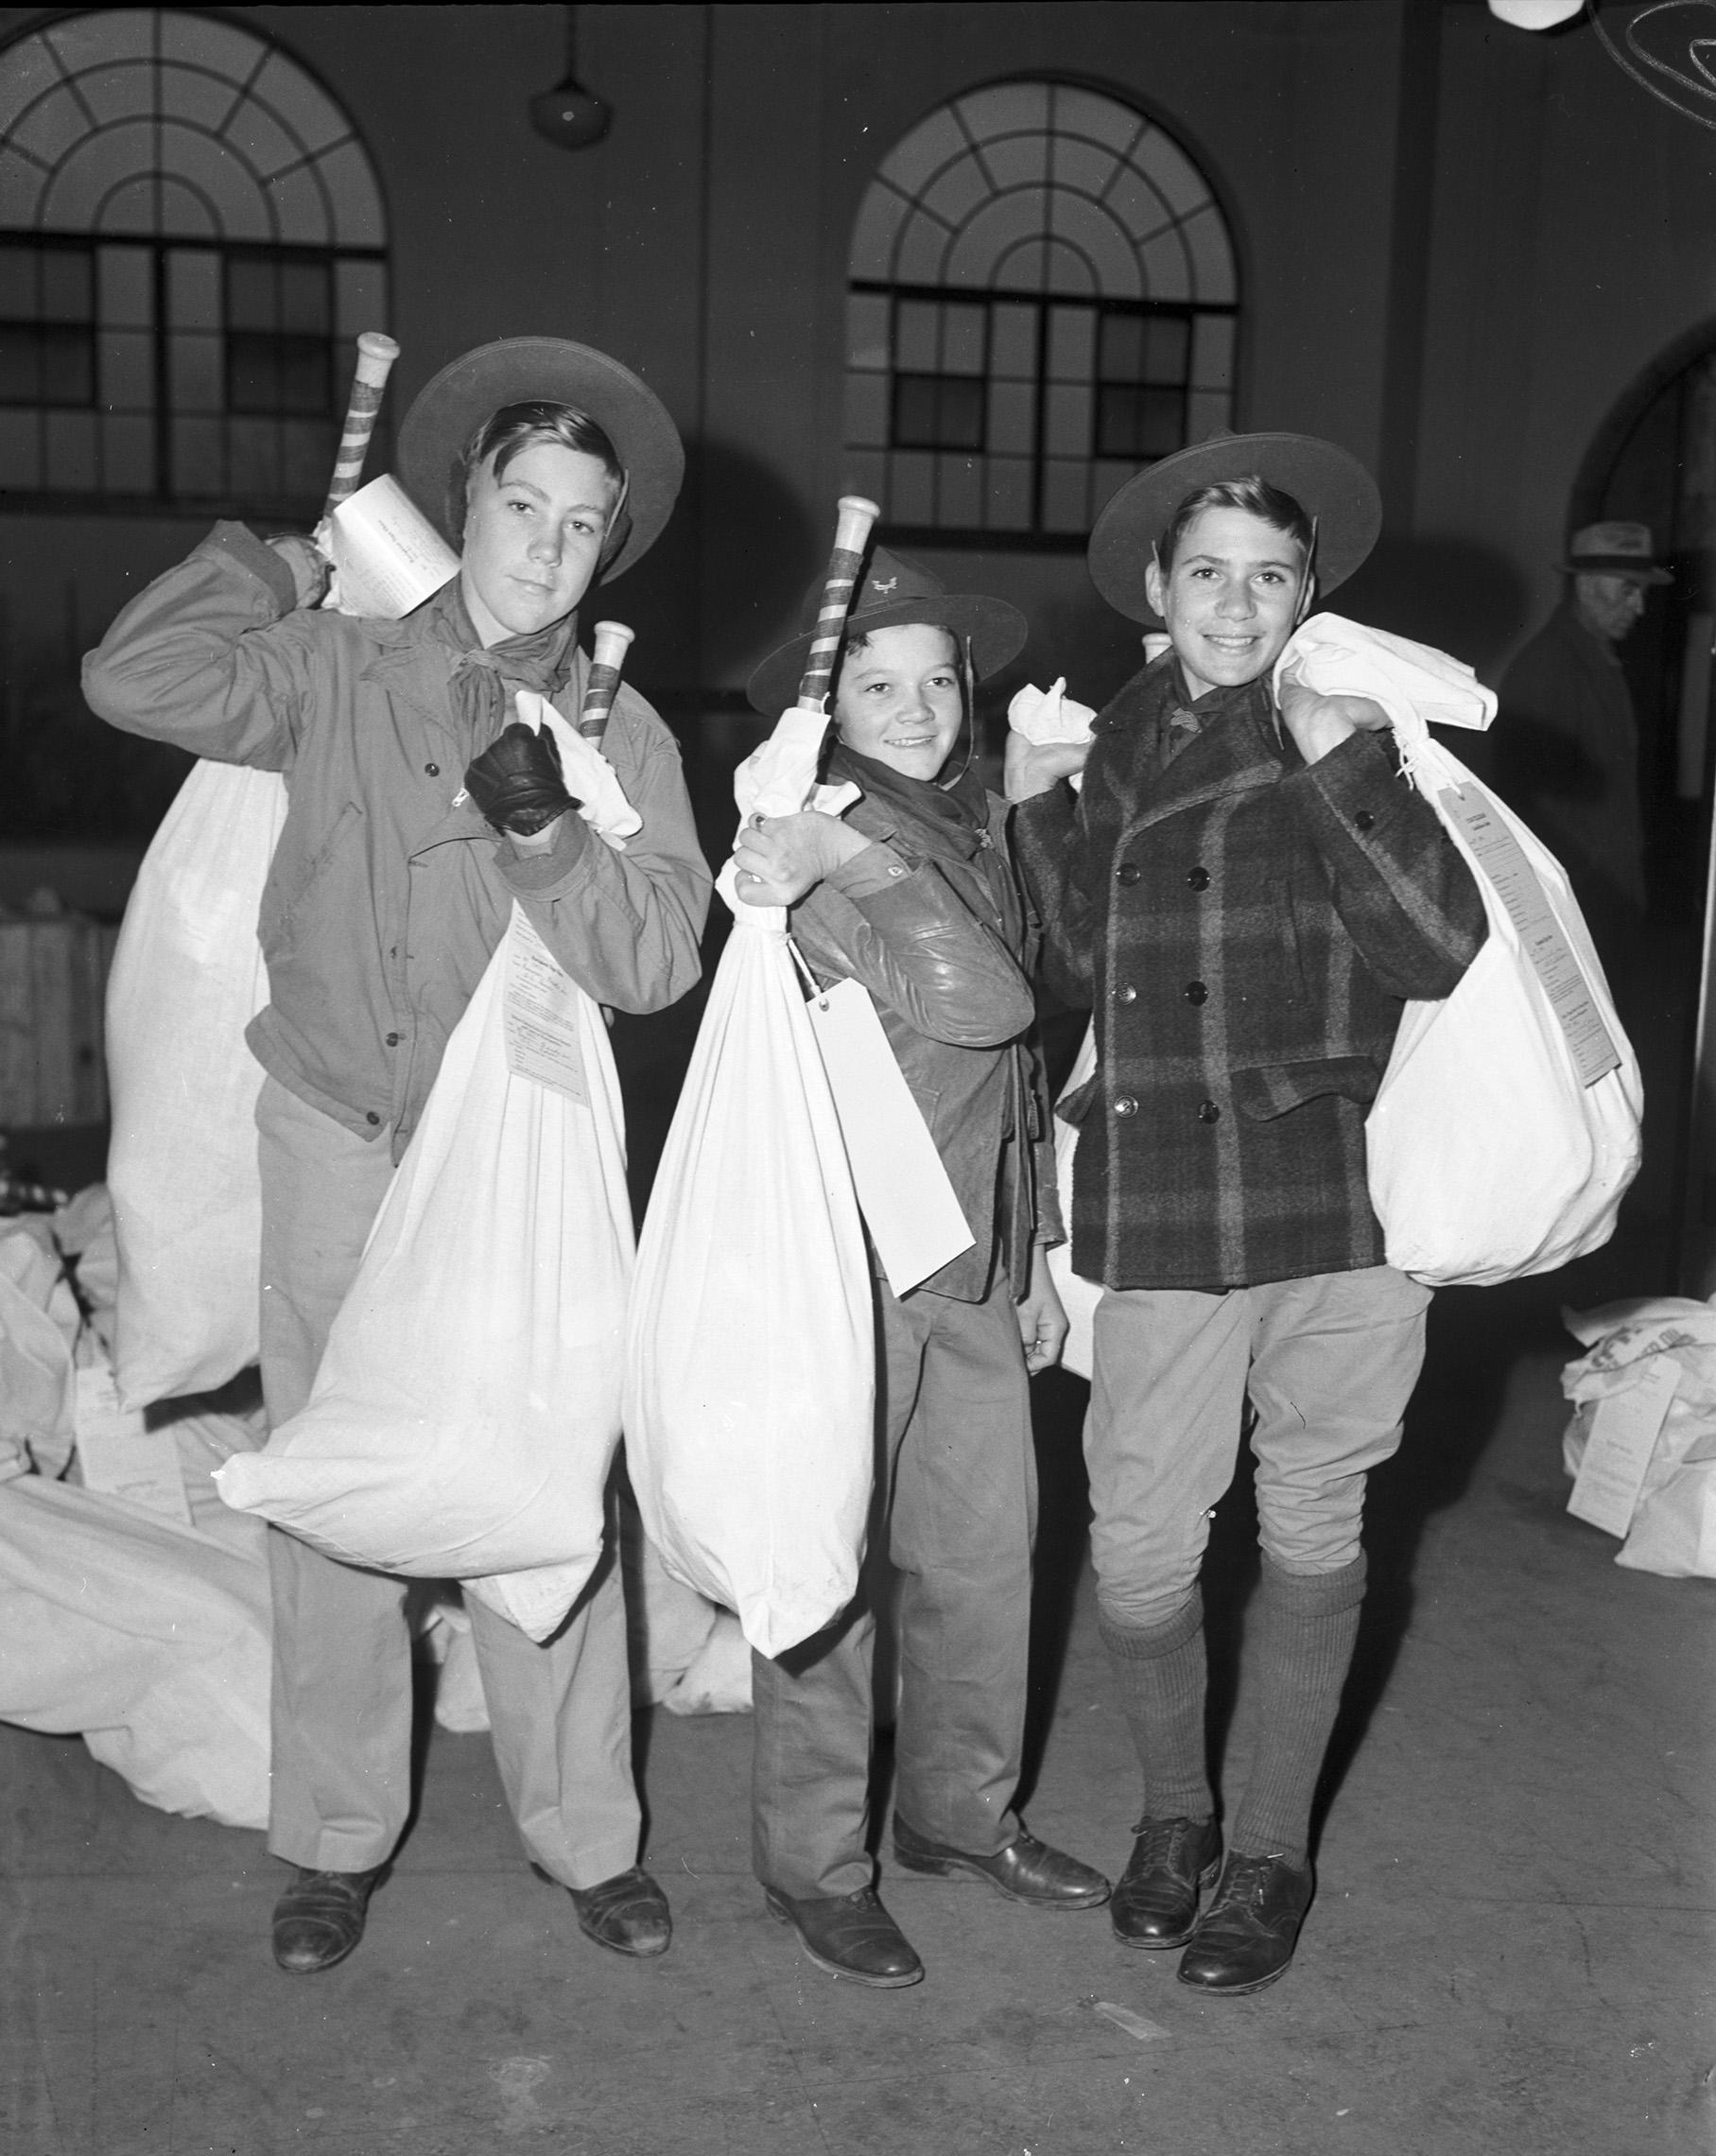 Goodfellow_Boy Scouts_1944.jpg